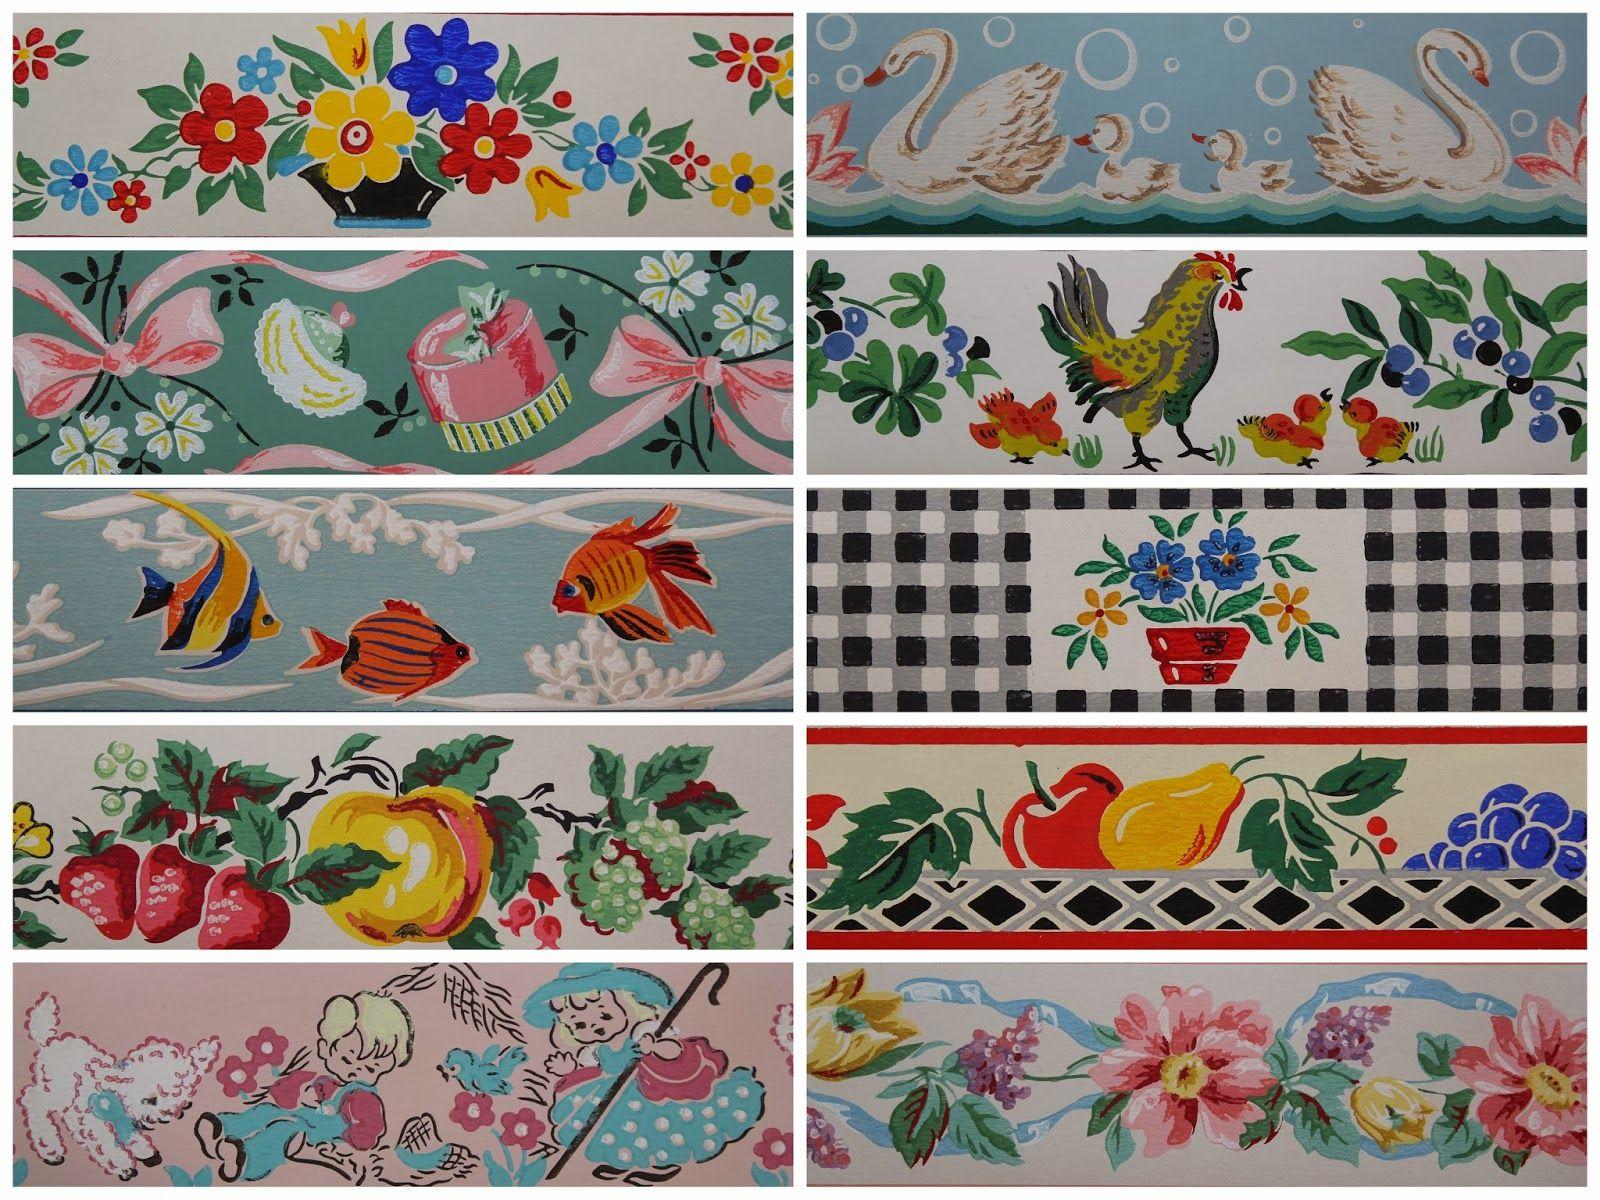 Rosie's Vintage Wallpaper Trimz Borders for sale Vintage